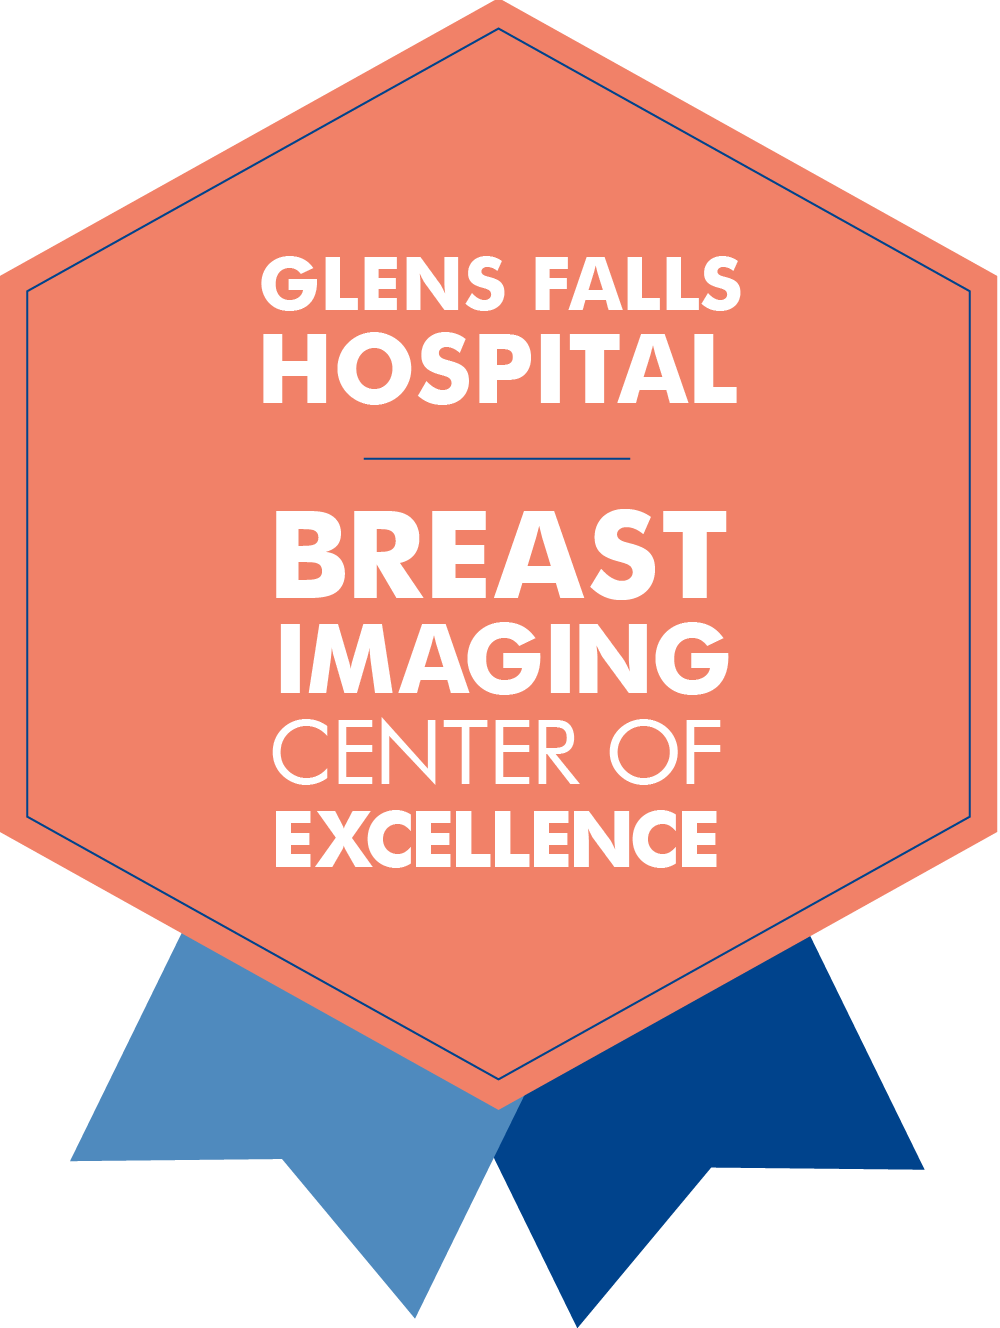 Glens Falls Hospital - Breast Image Center of Excellence